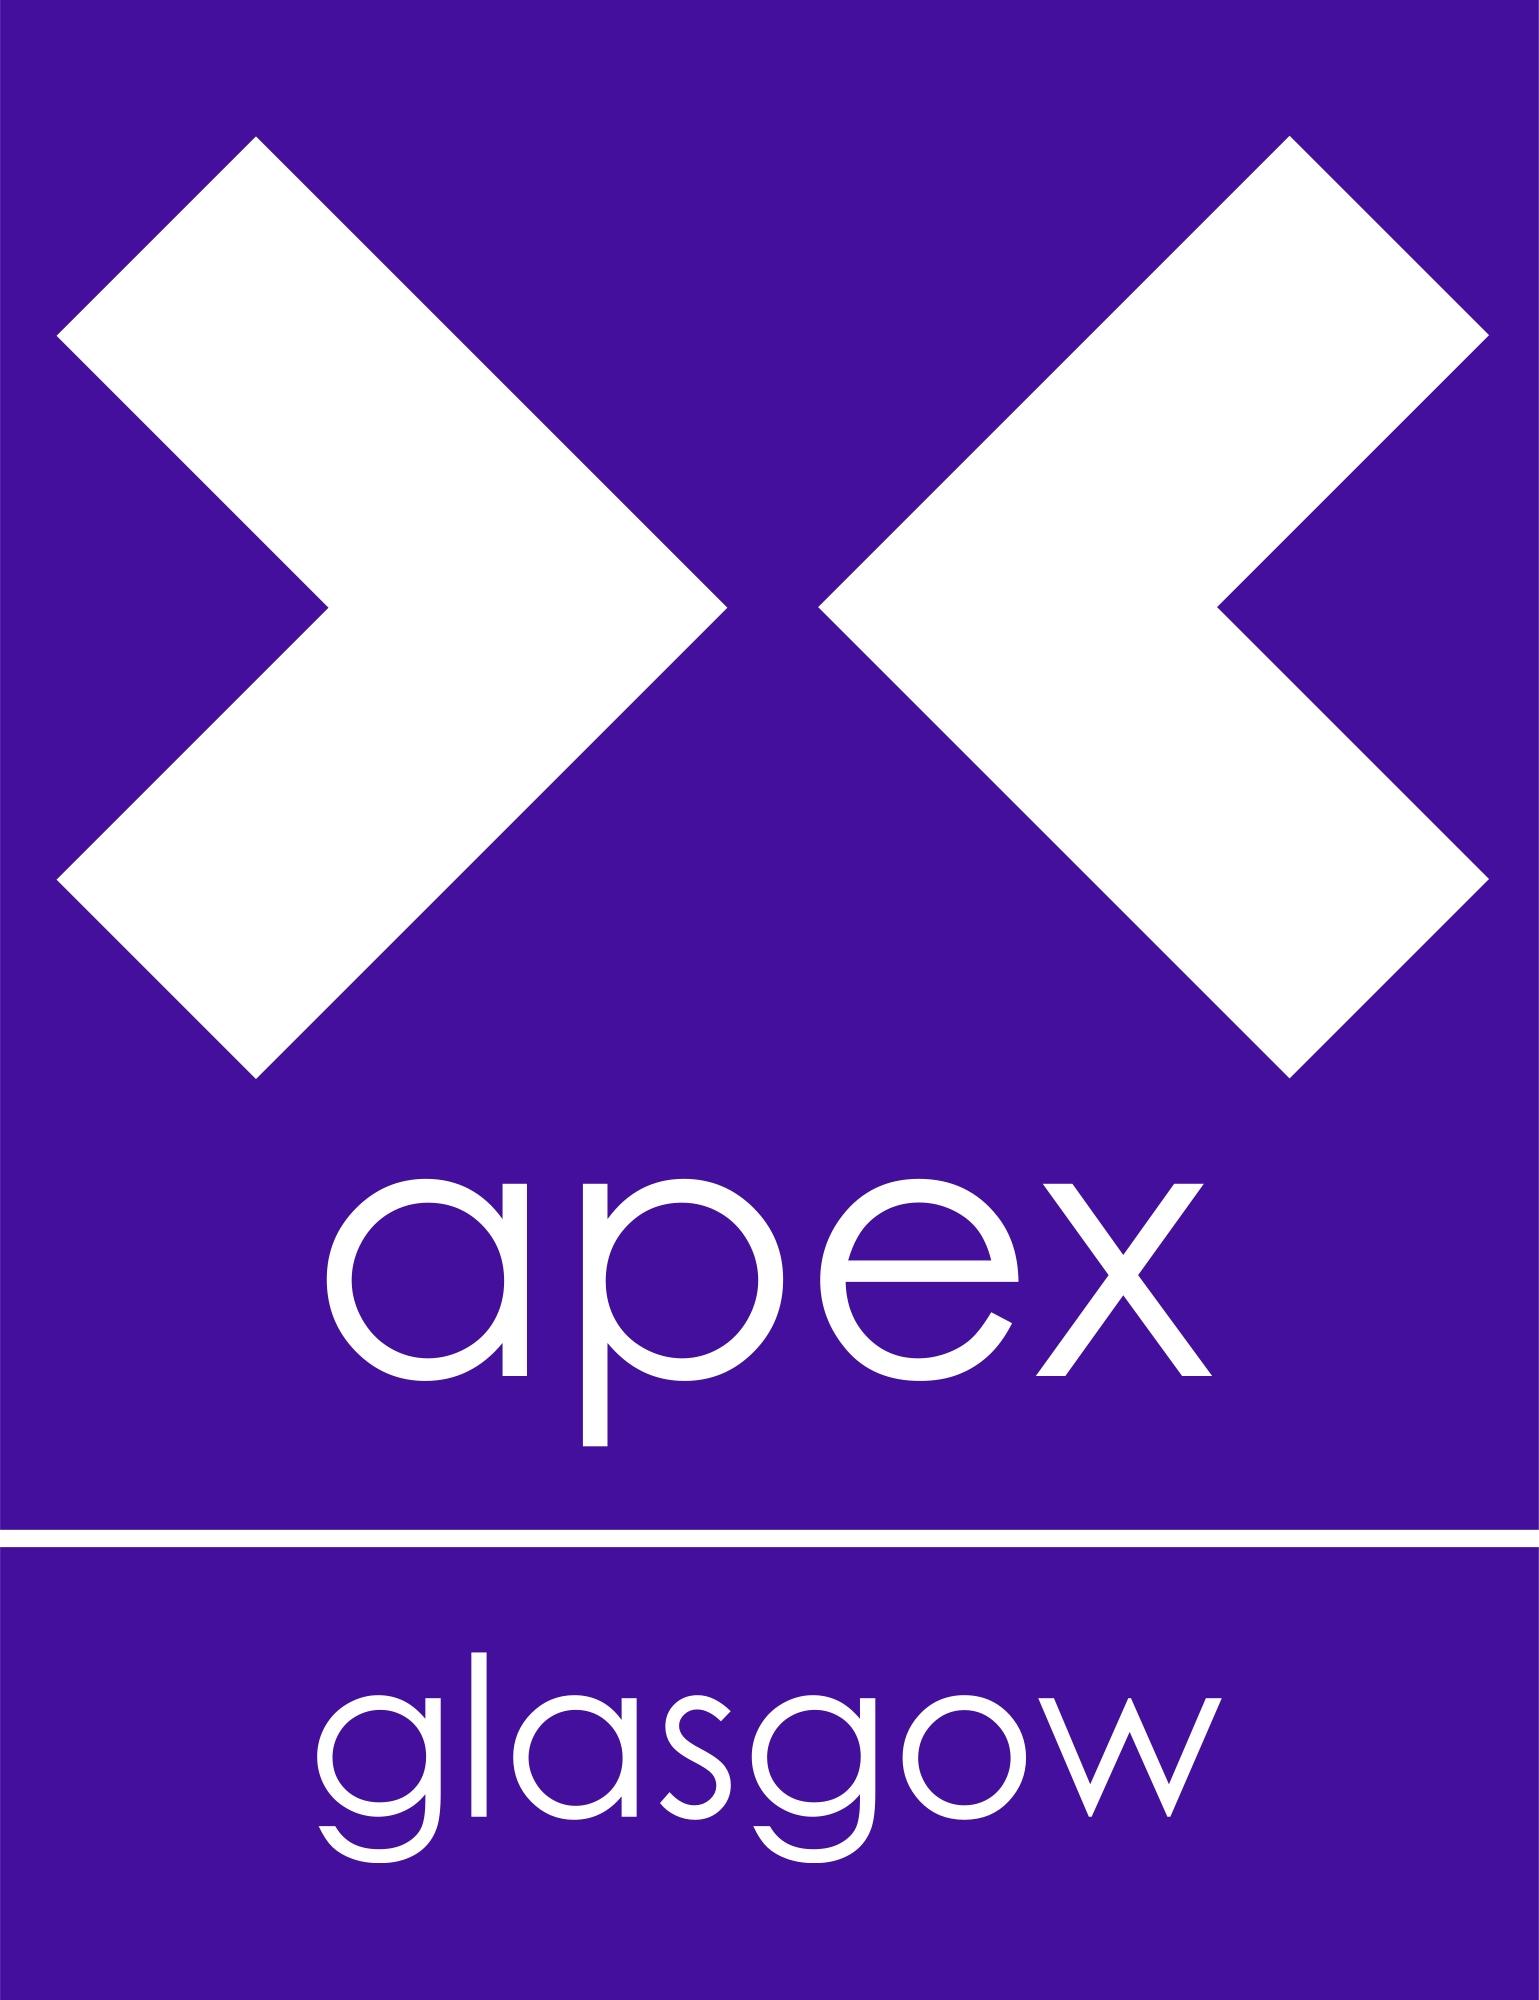 Apex Glasgow